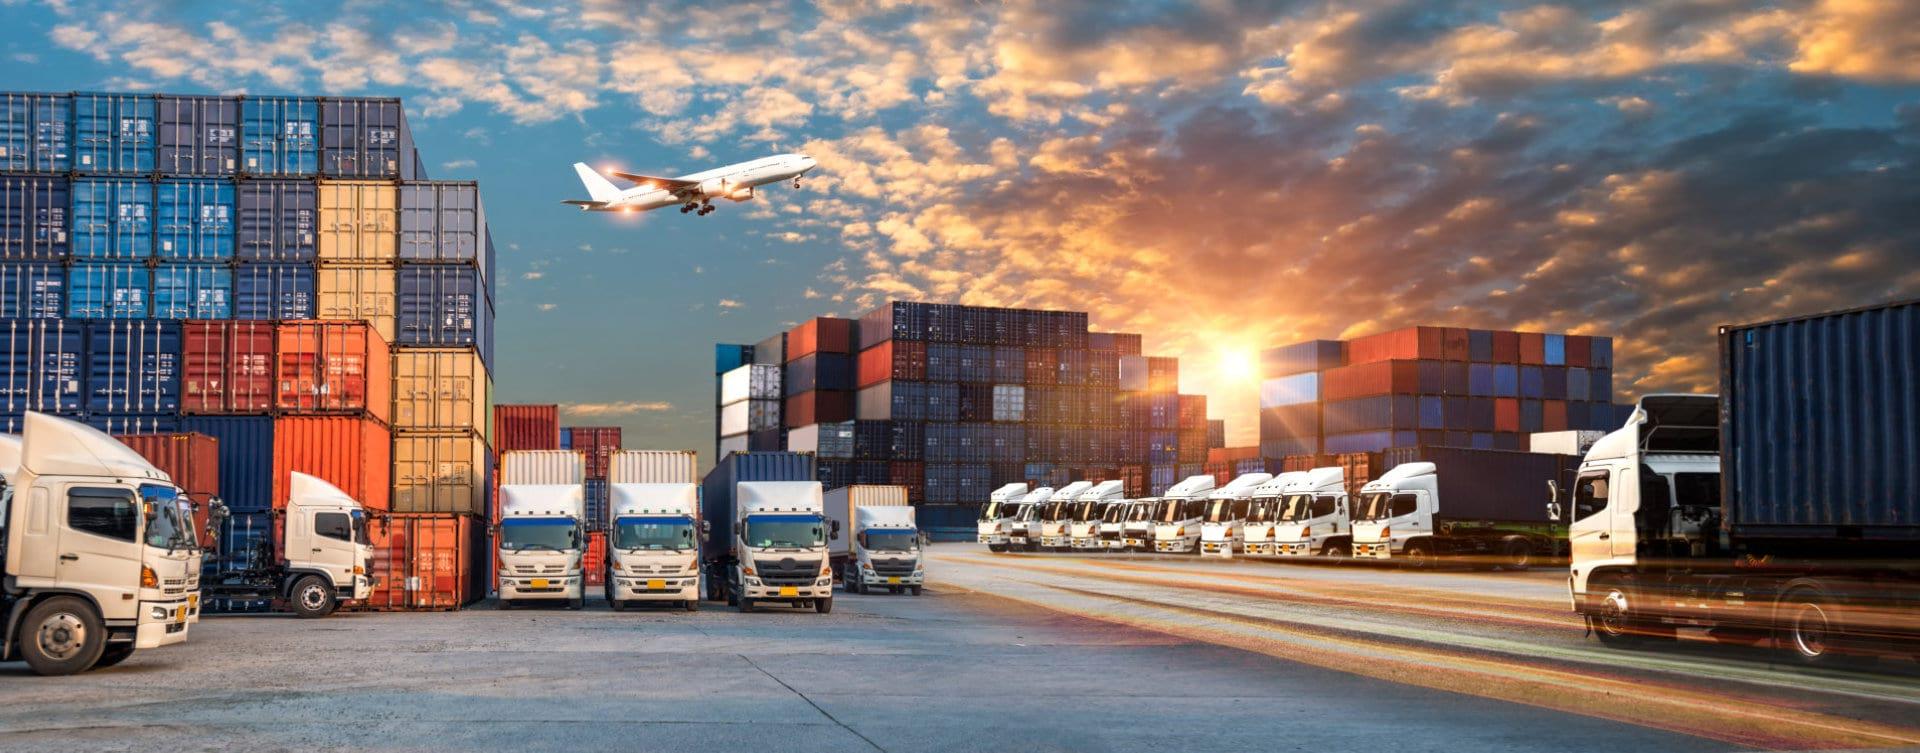 trucks and cargos